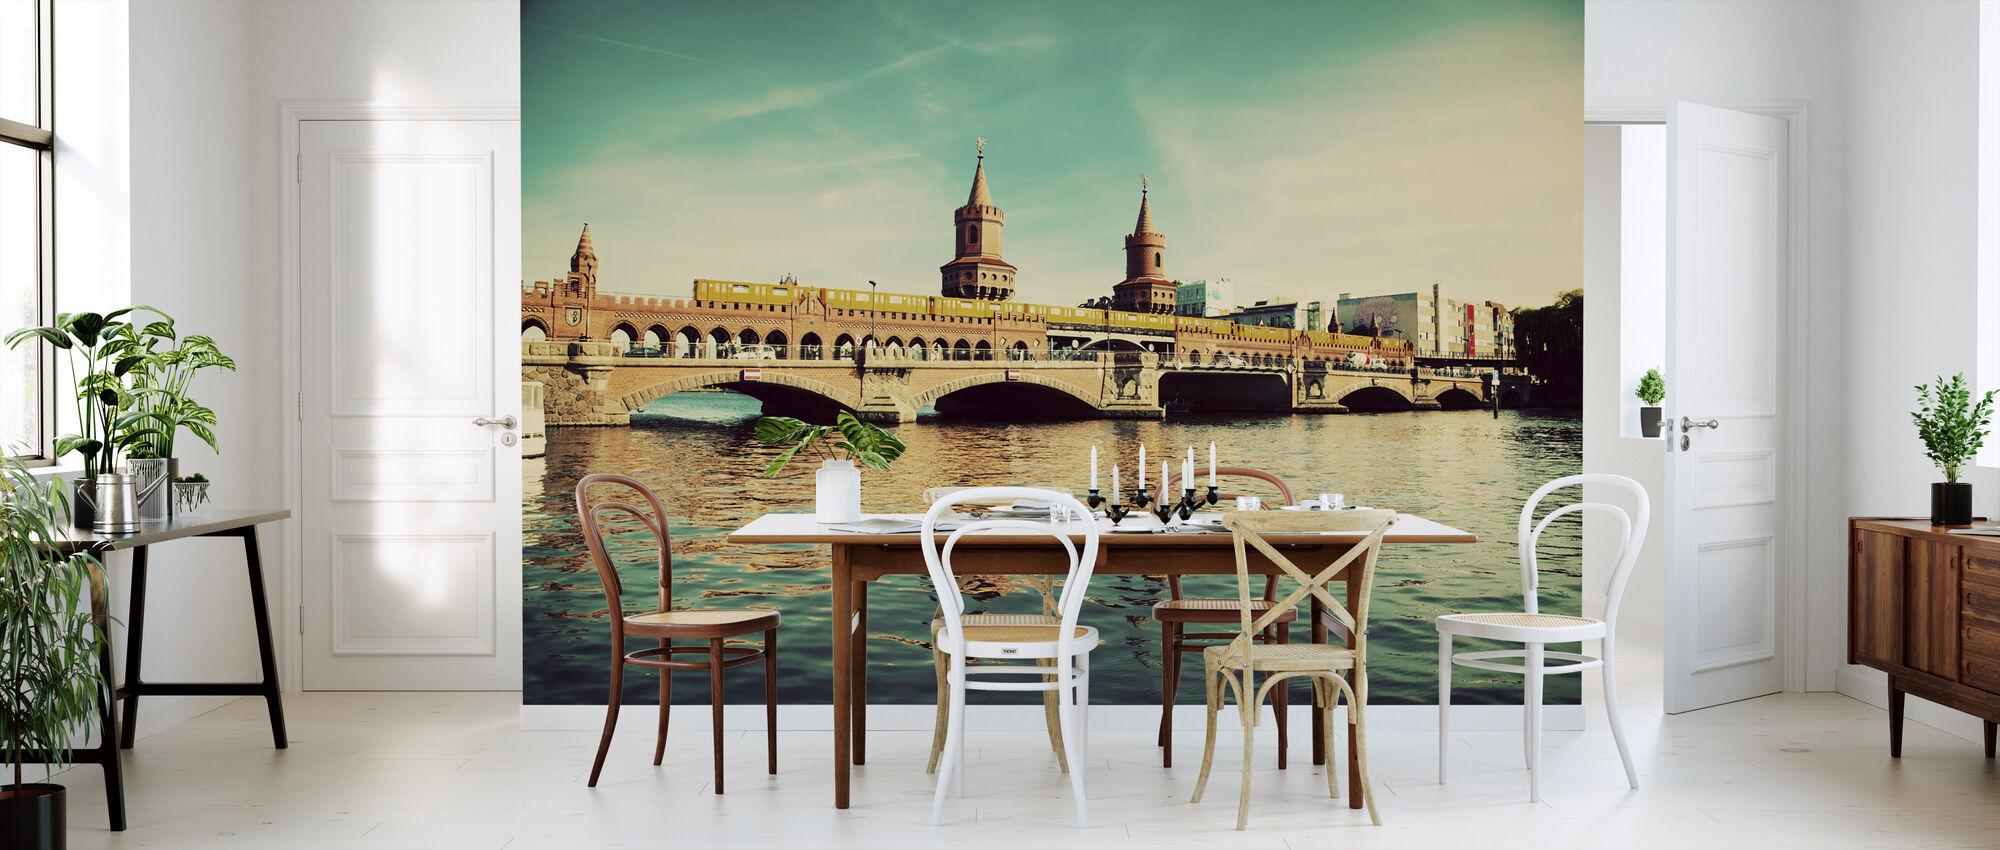 The Oberbaum Bridge and River Spree in Berlin - Wallpaper - Kitchen